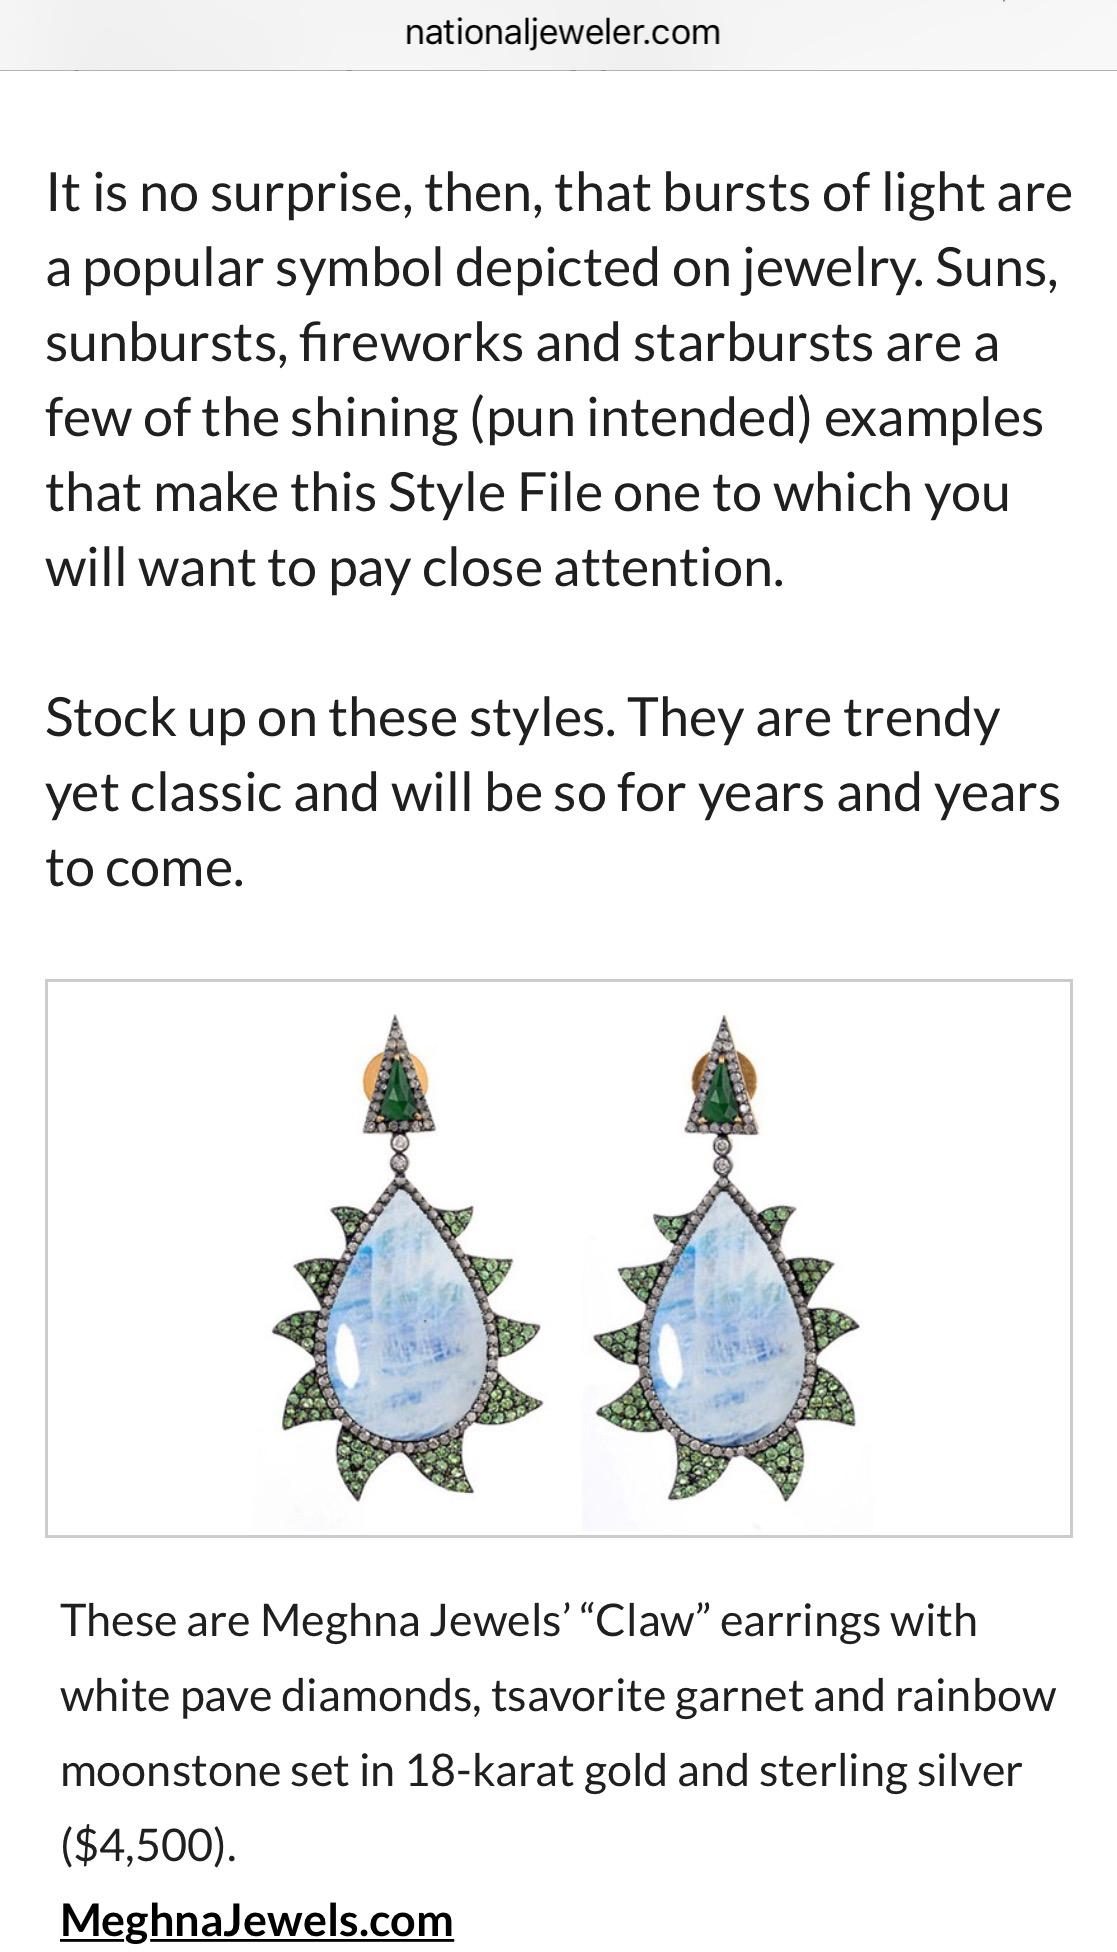 National Jeweler - Claw Earrings